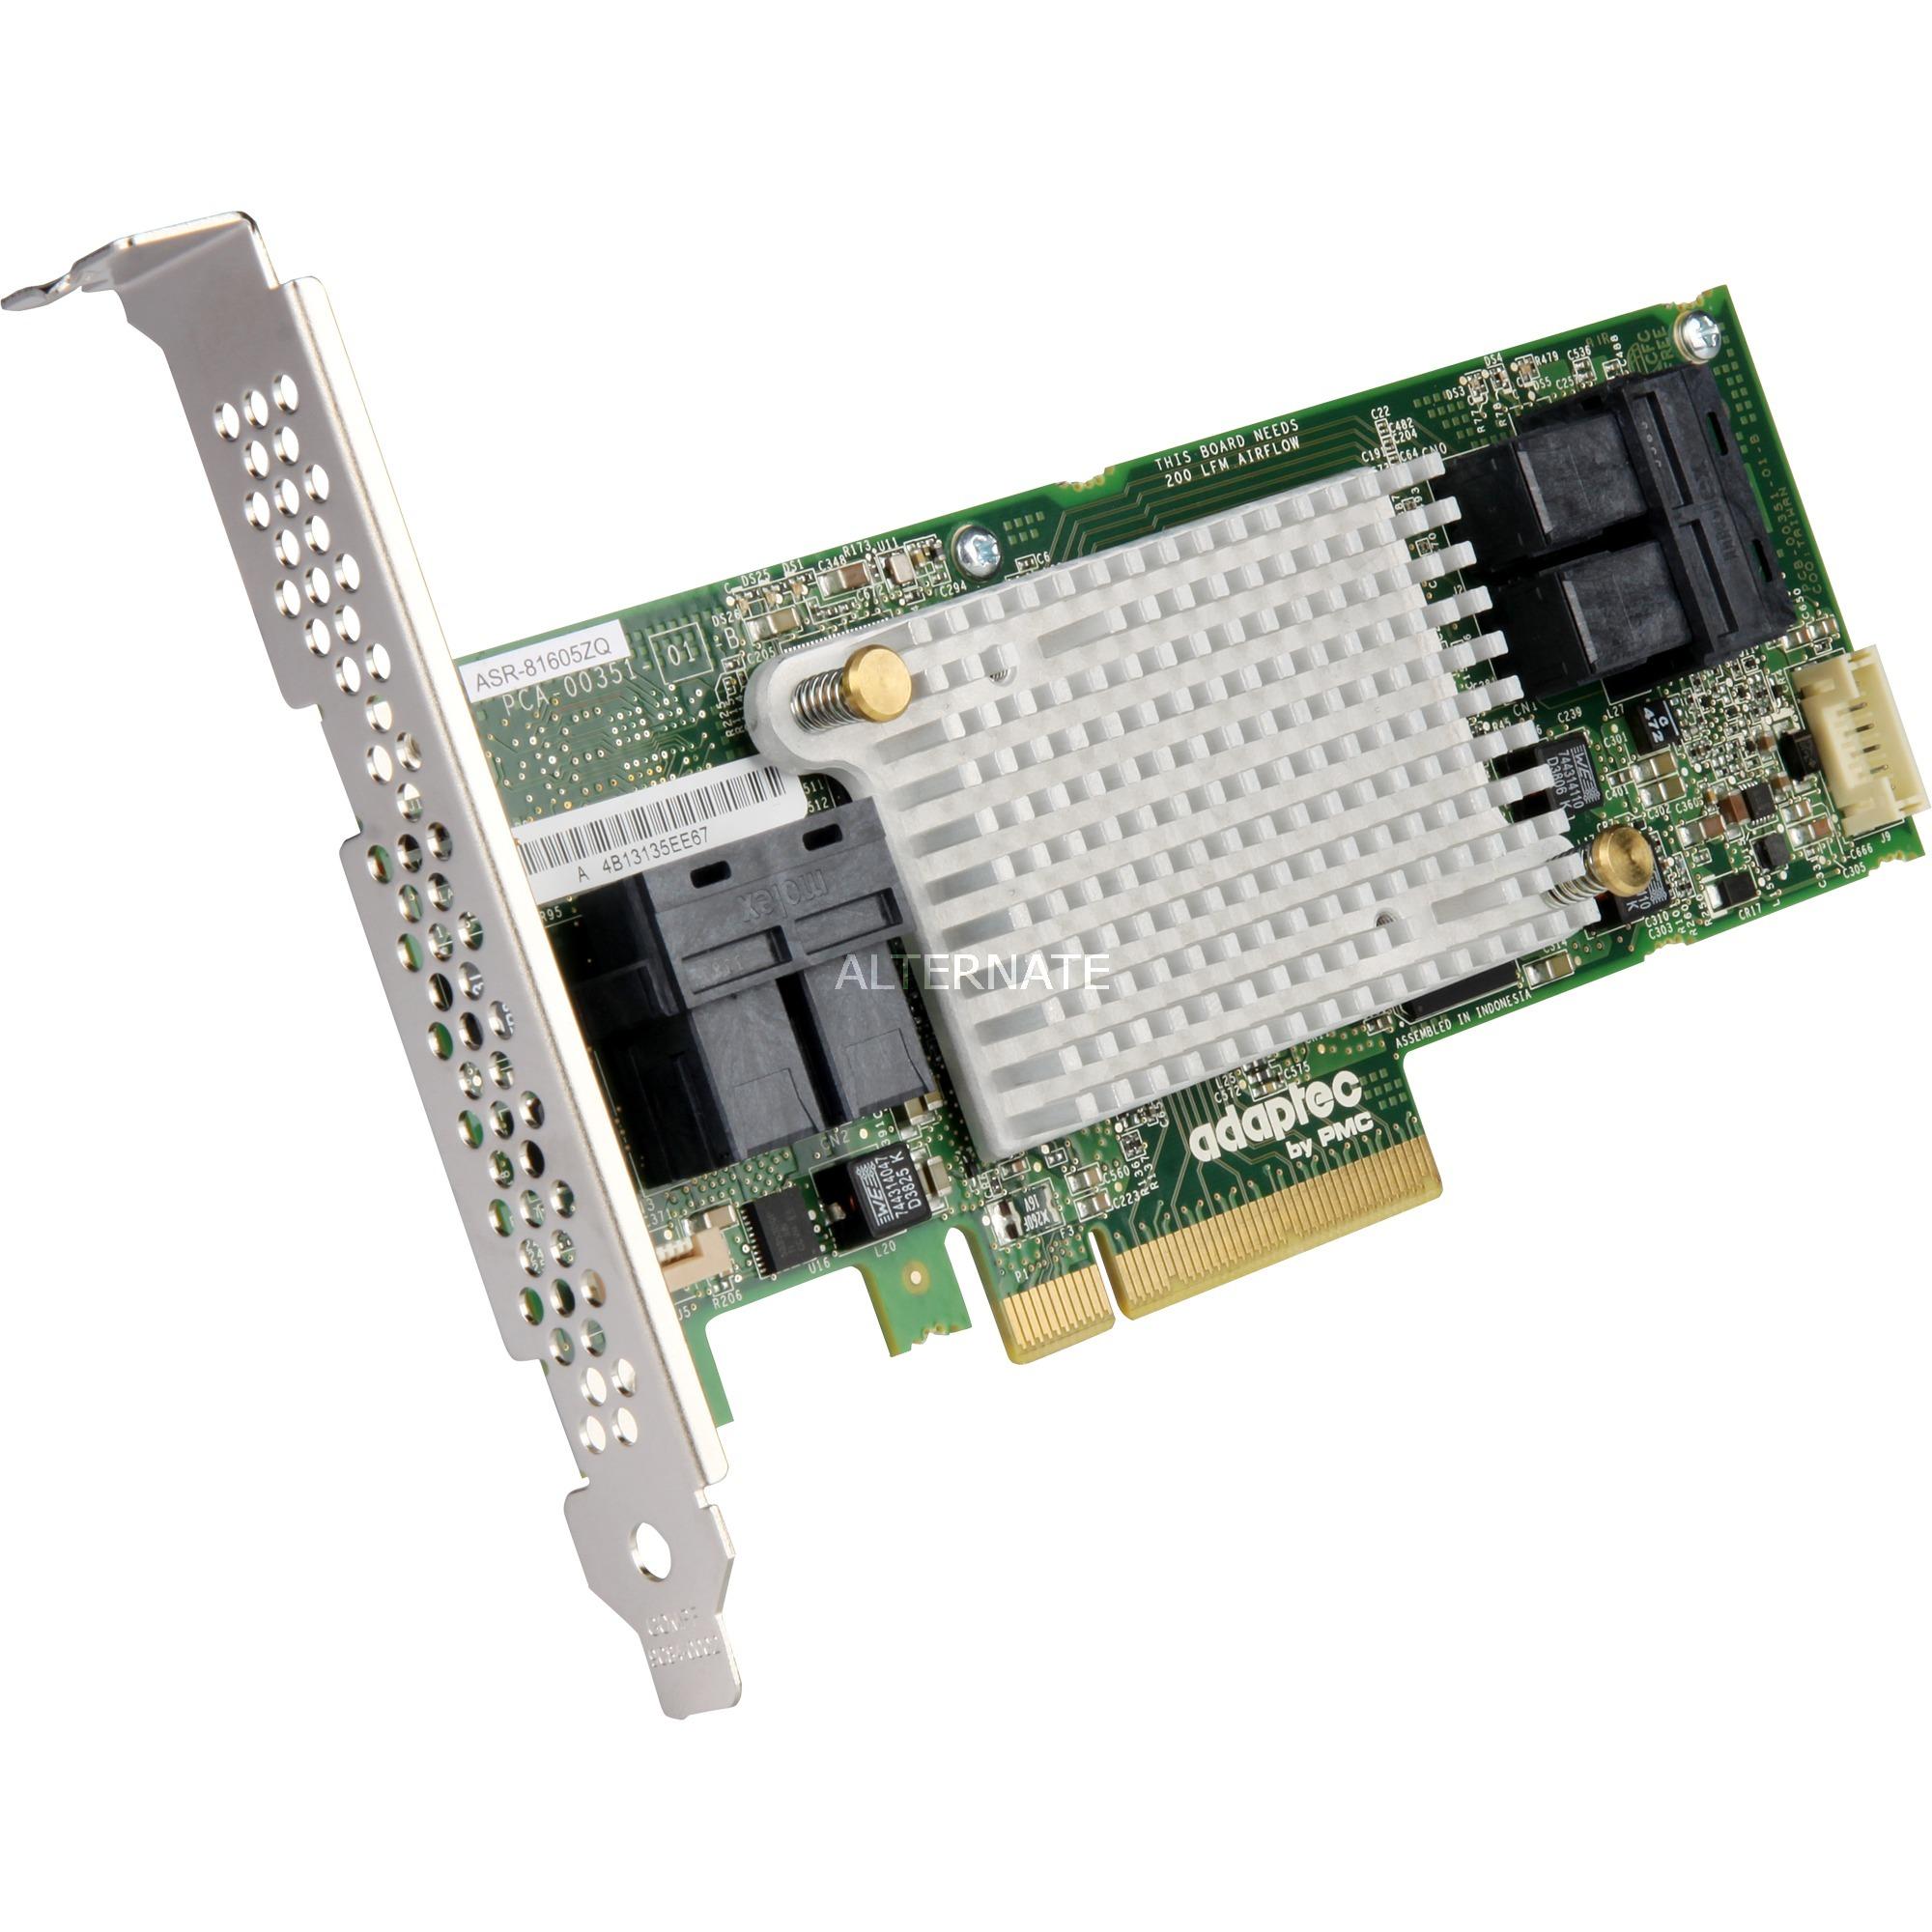 ADAPTEC RAID 81605ZQ DRIVER WINDOWS XP